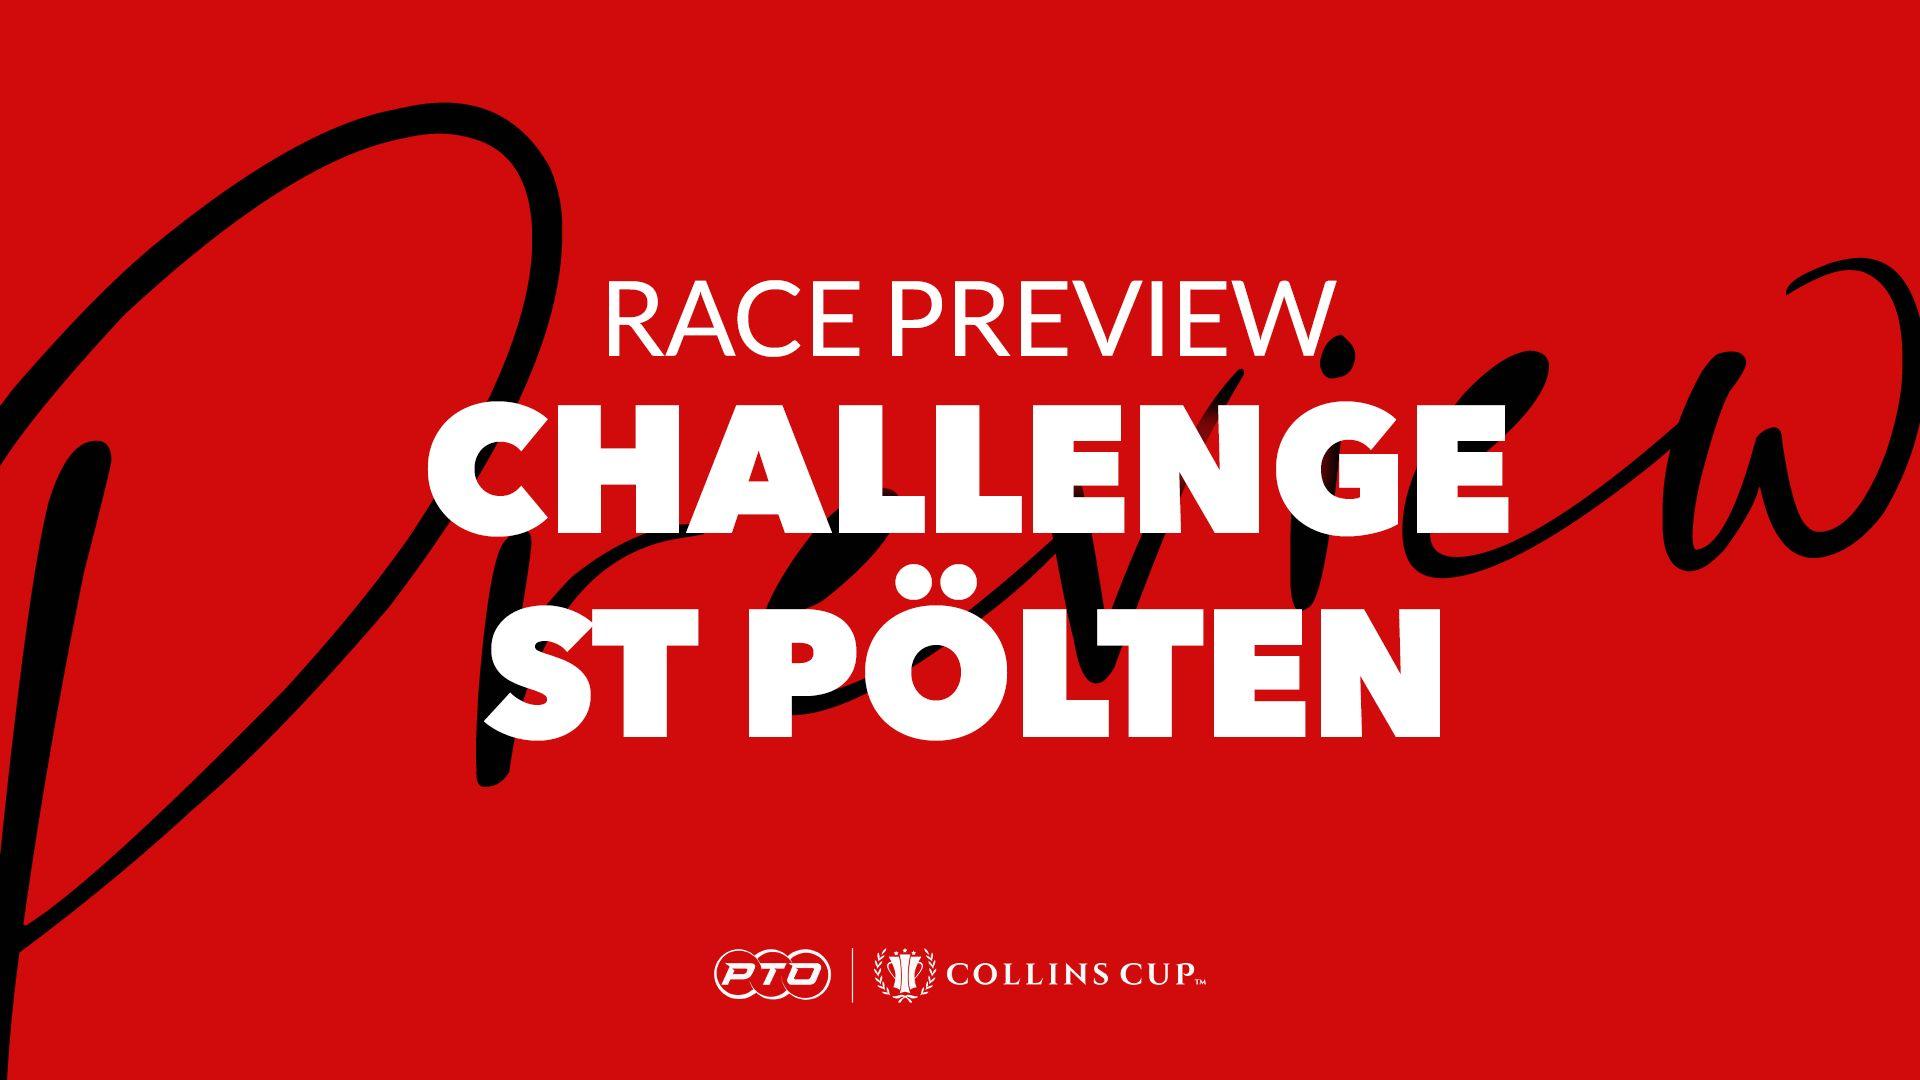 Race Preview: Challenge St. Pölten & TradeInn International Triathlon 140.6INN